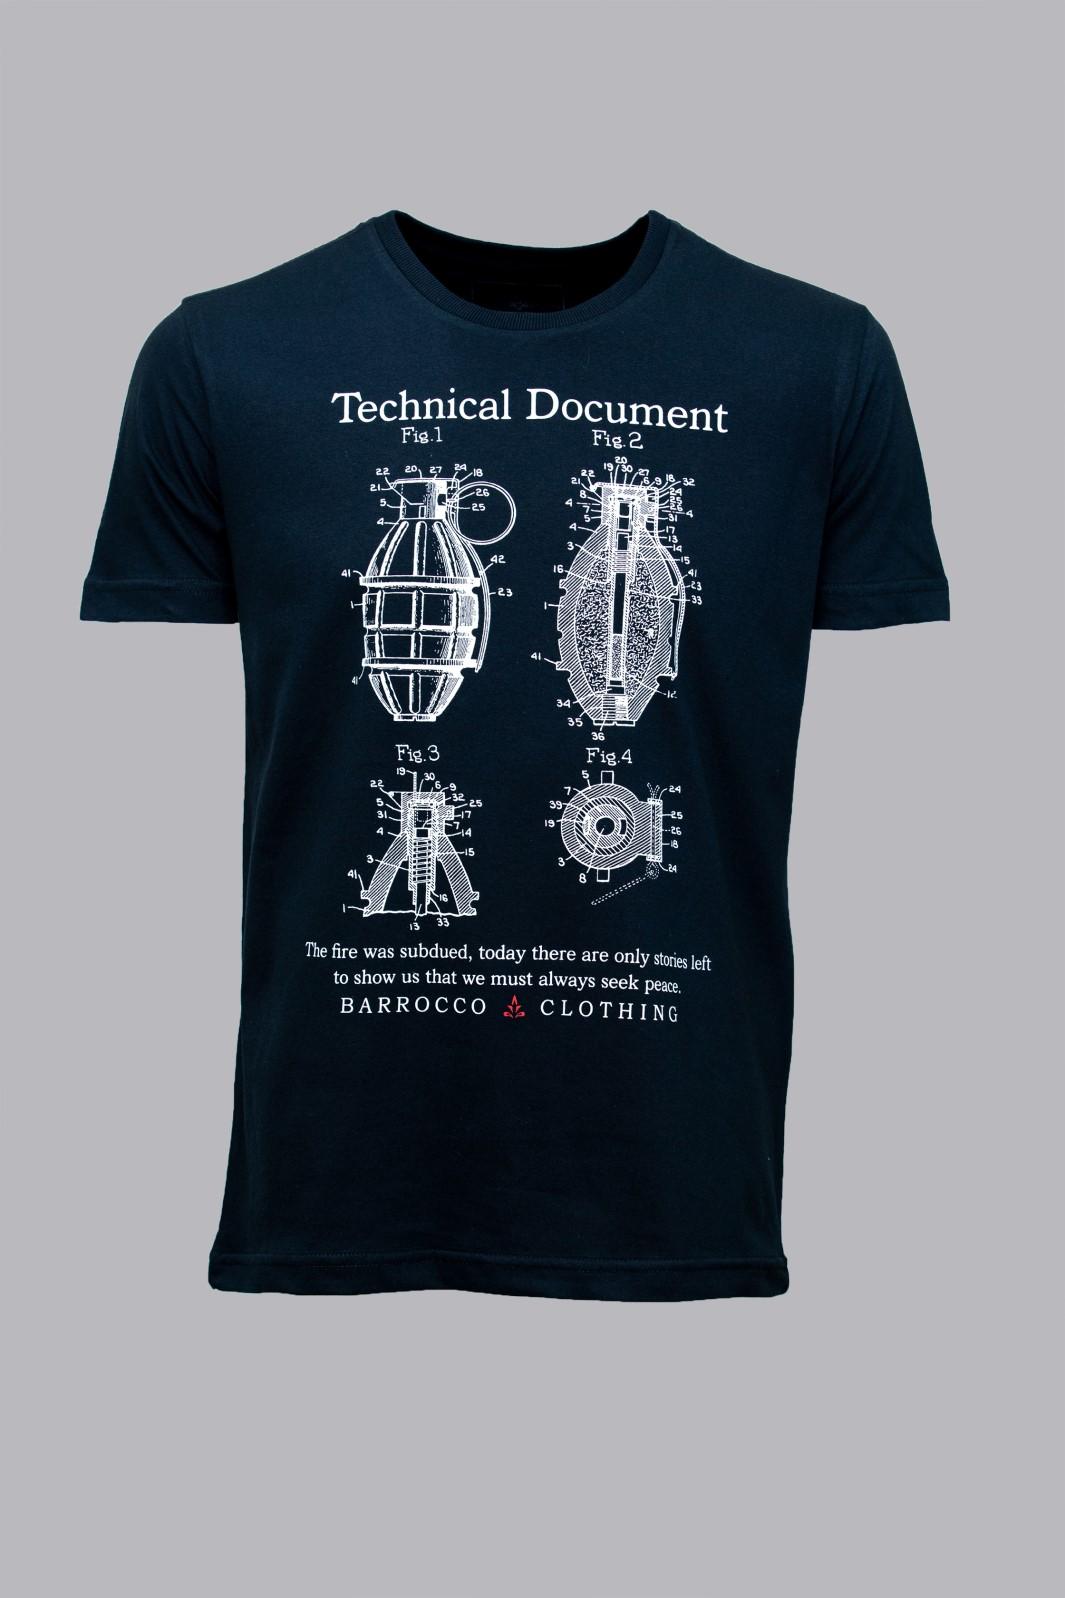 Camiseta Barrocco Technical Document